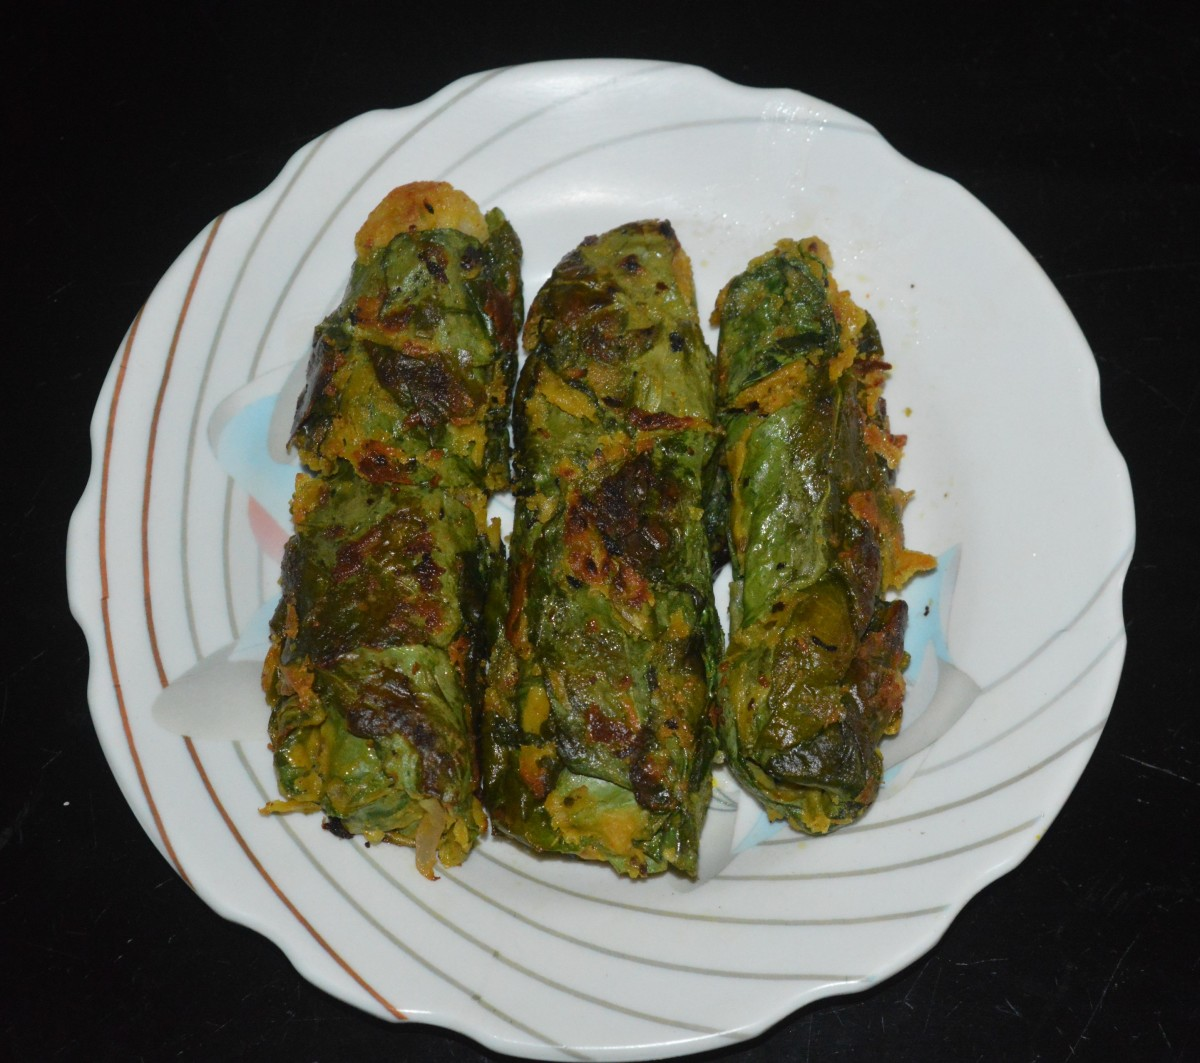 Palak Rolls (Spinach Rolls)